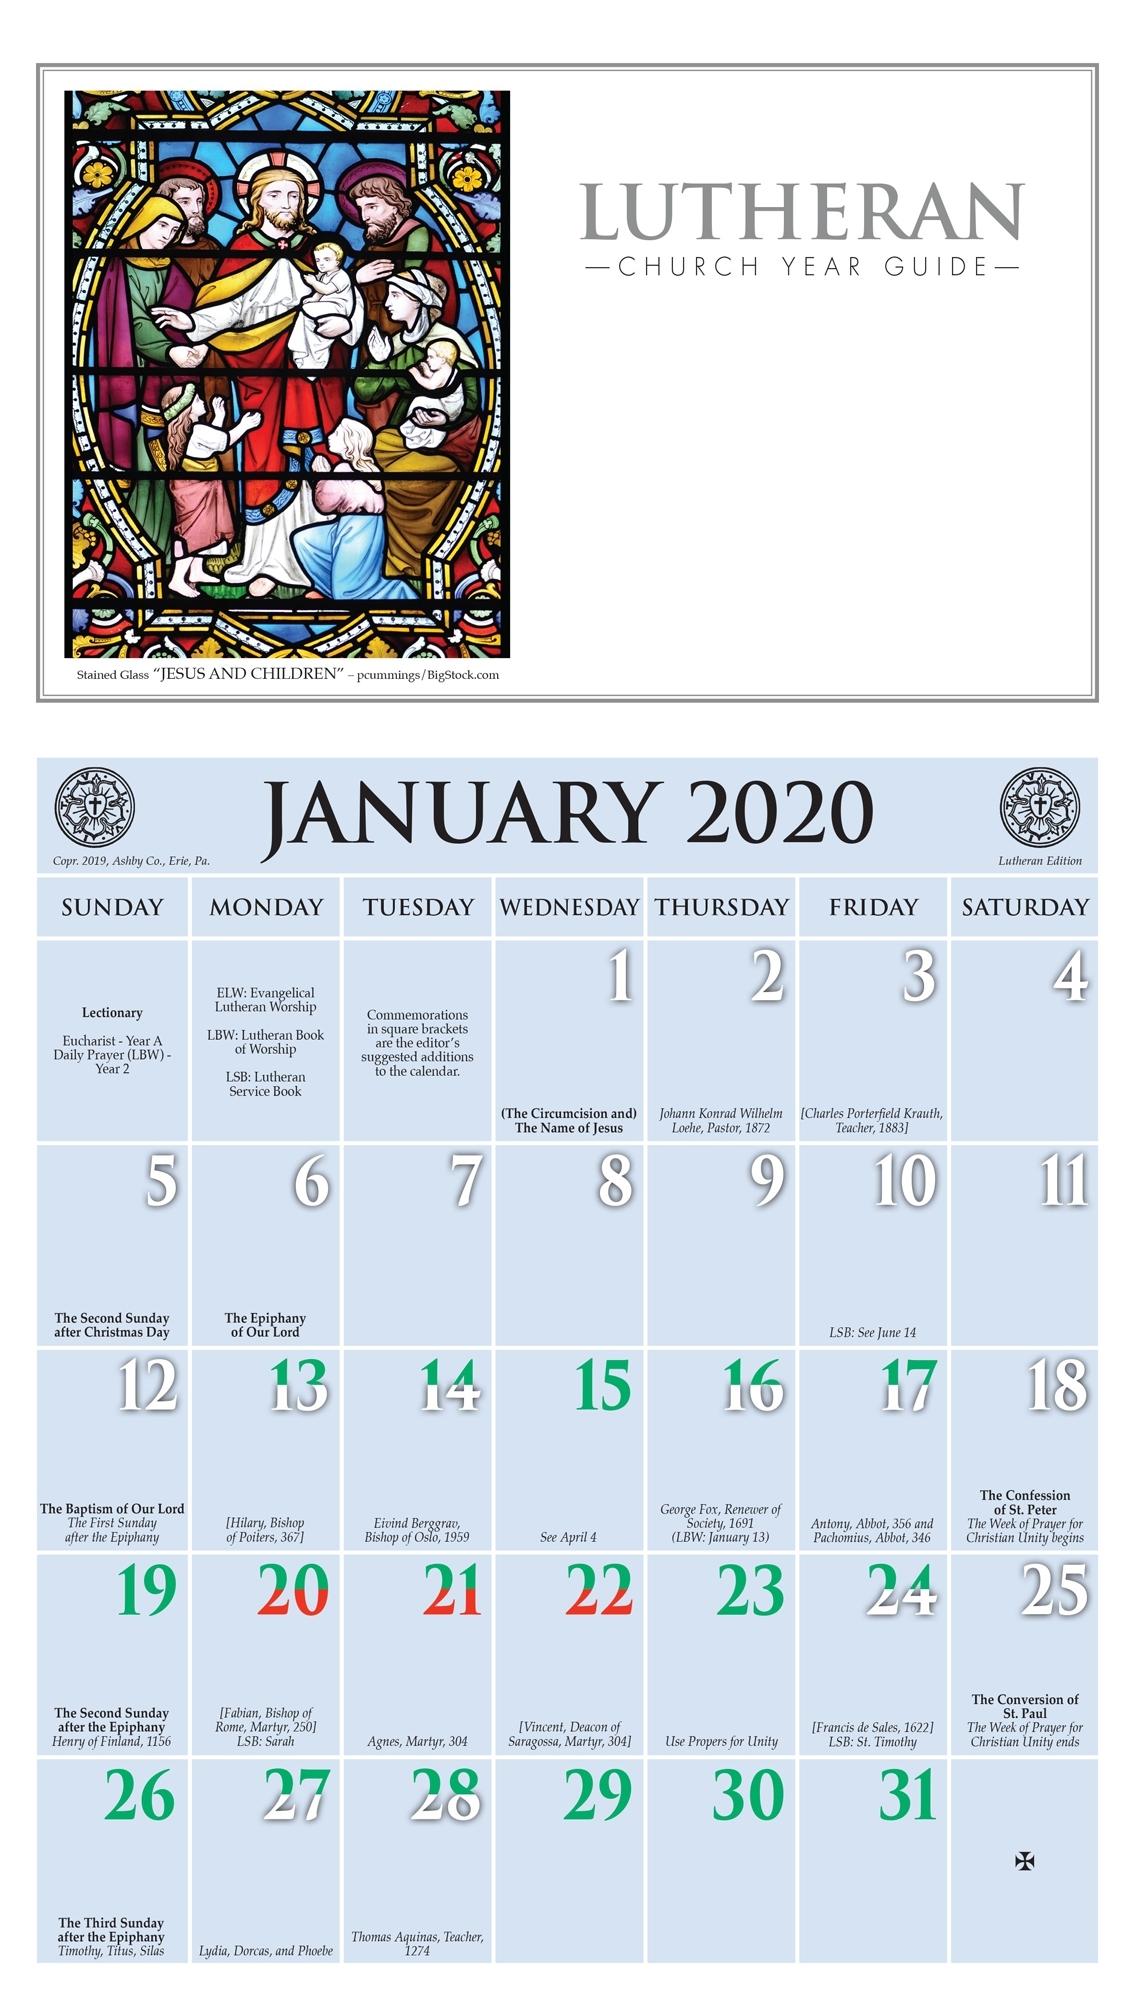 Church Calendar 2020 - Slubne-Suknie with Printable Catholic Liturgical Calendar 2019 2020